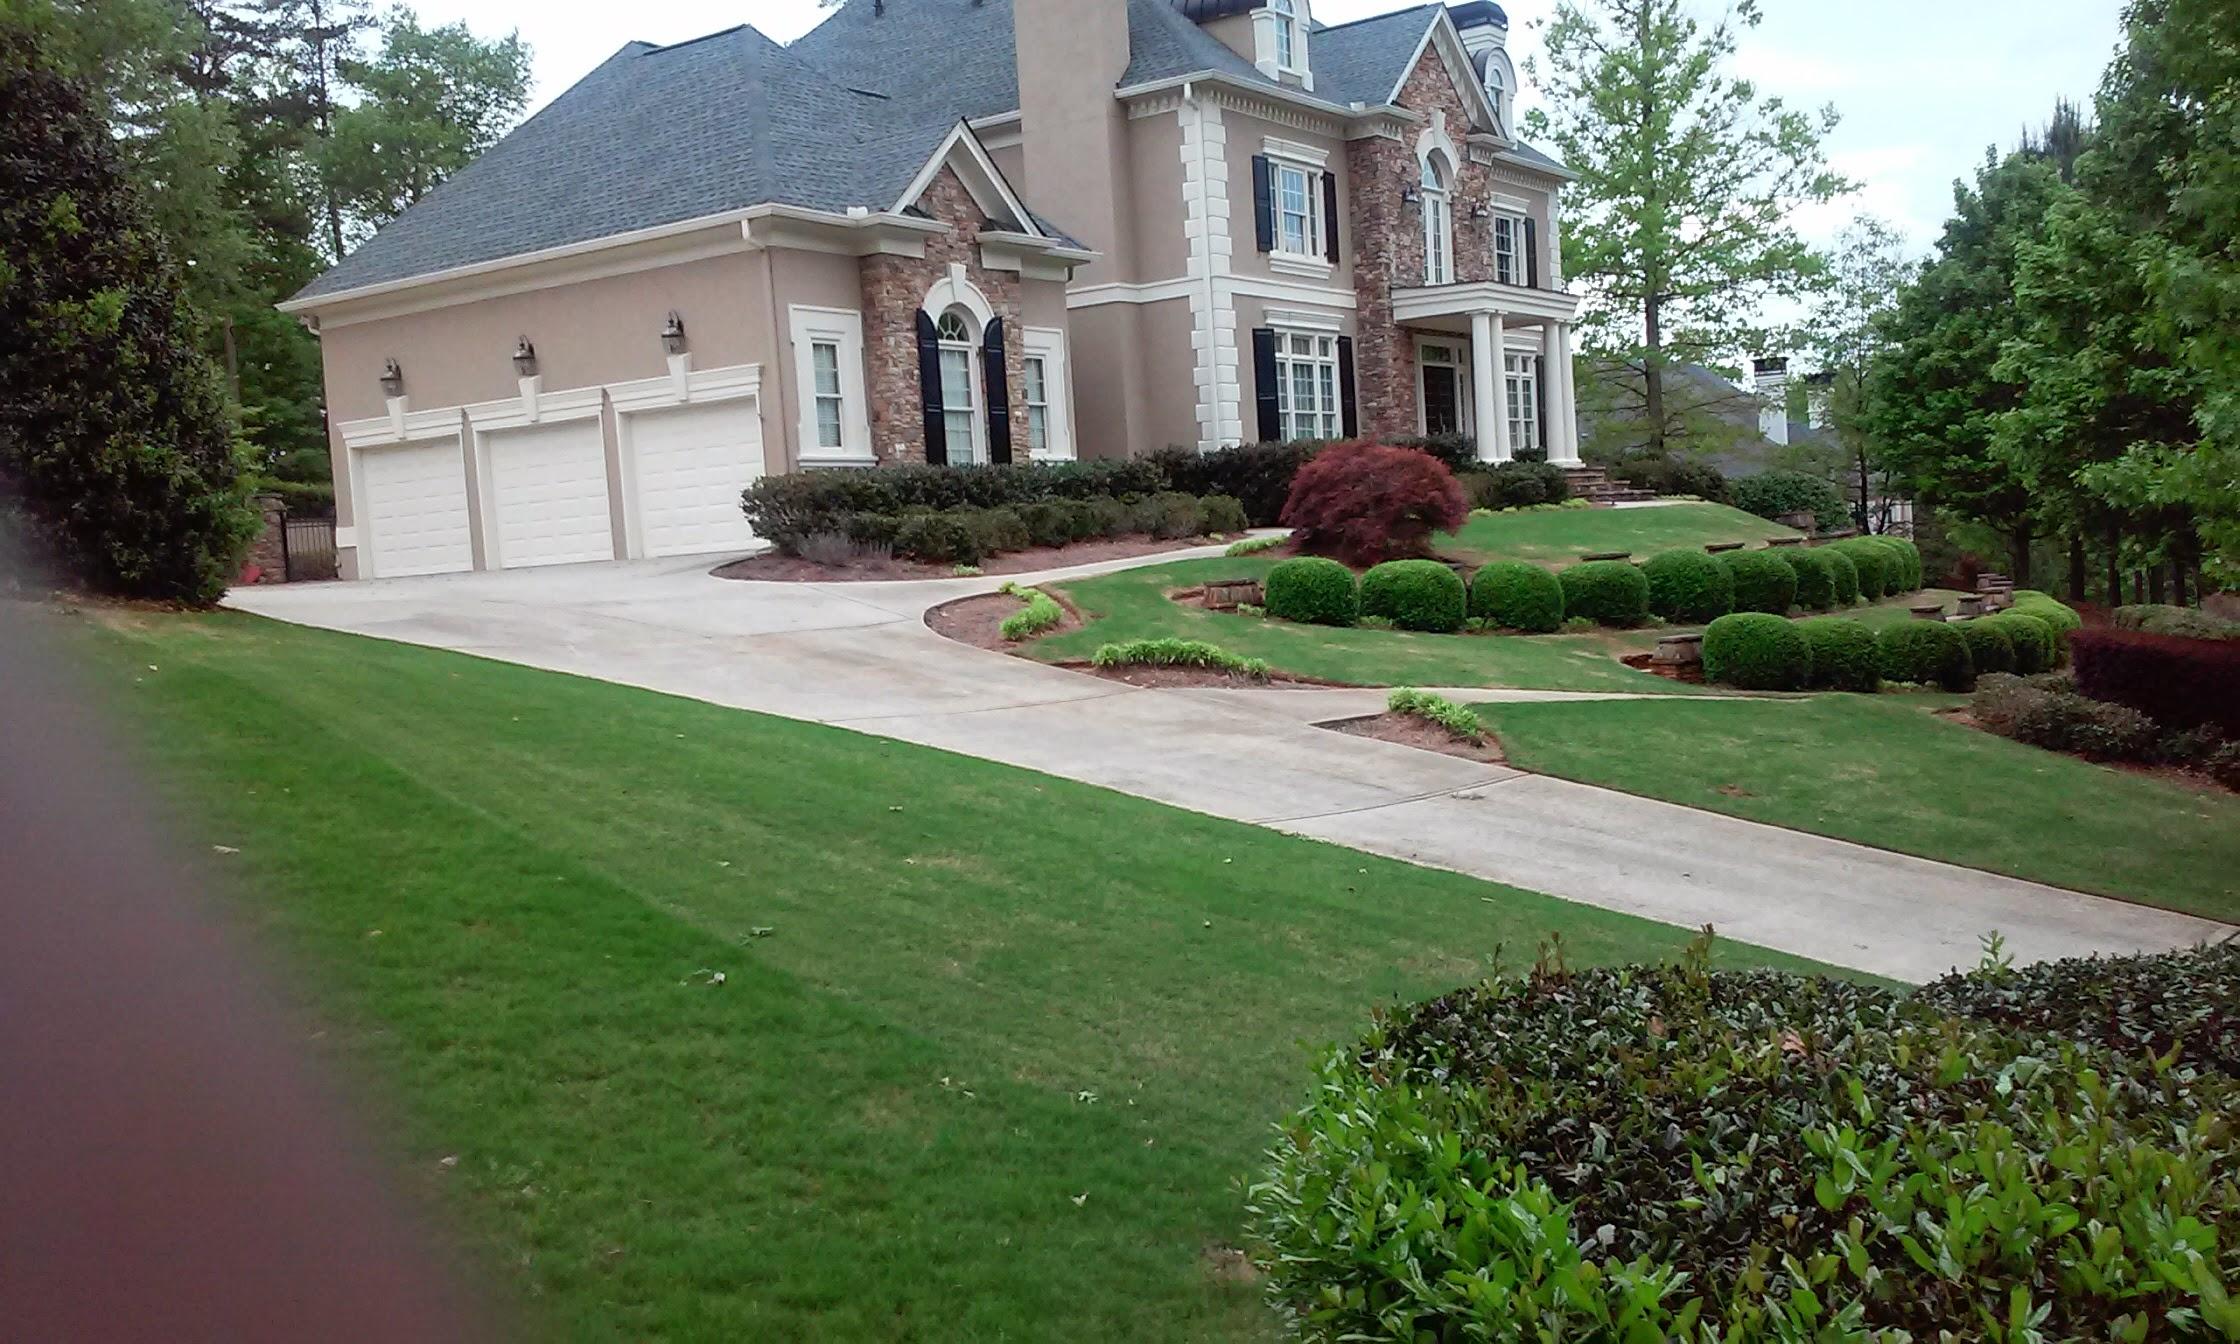 Lawn Mowing Contractor in Alpheretta, GA, 30009